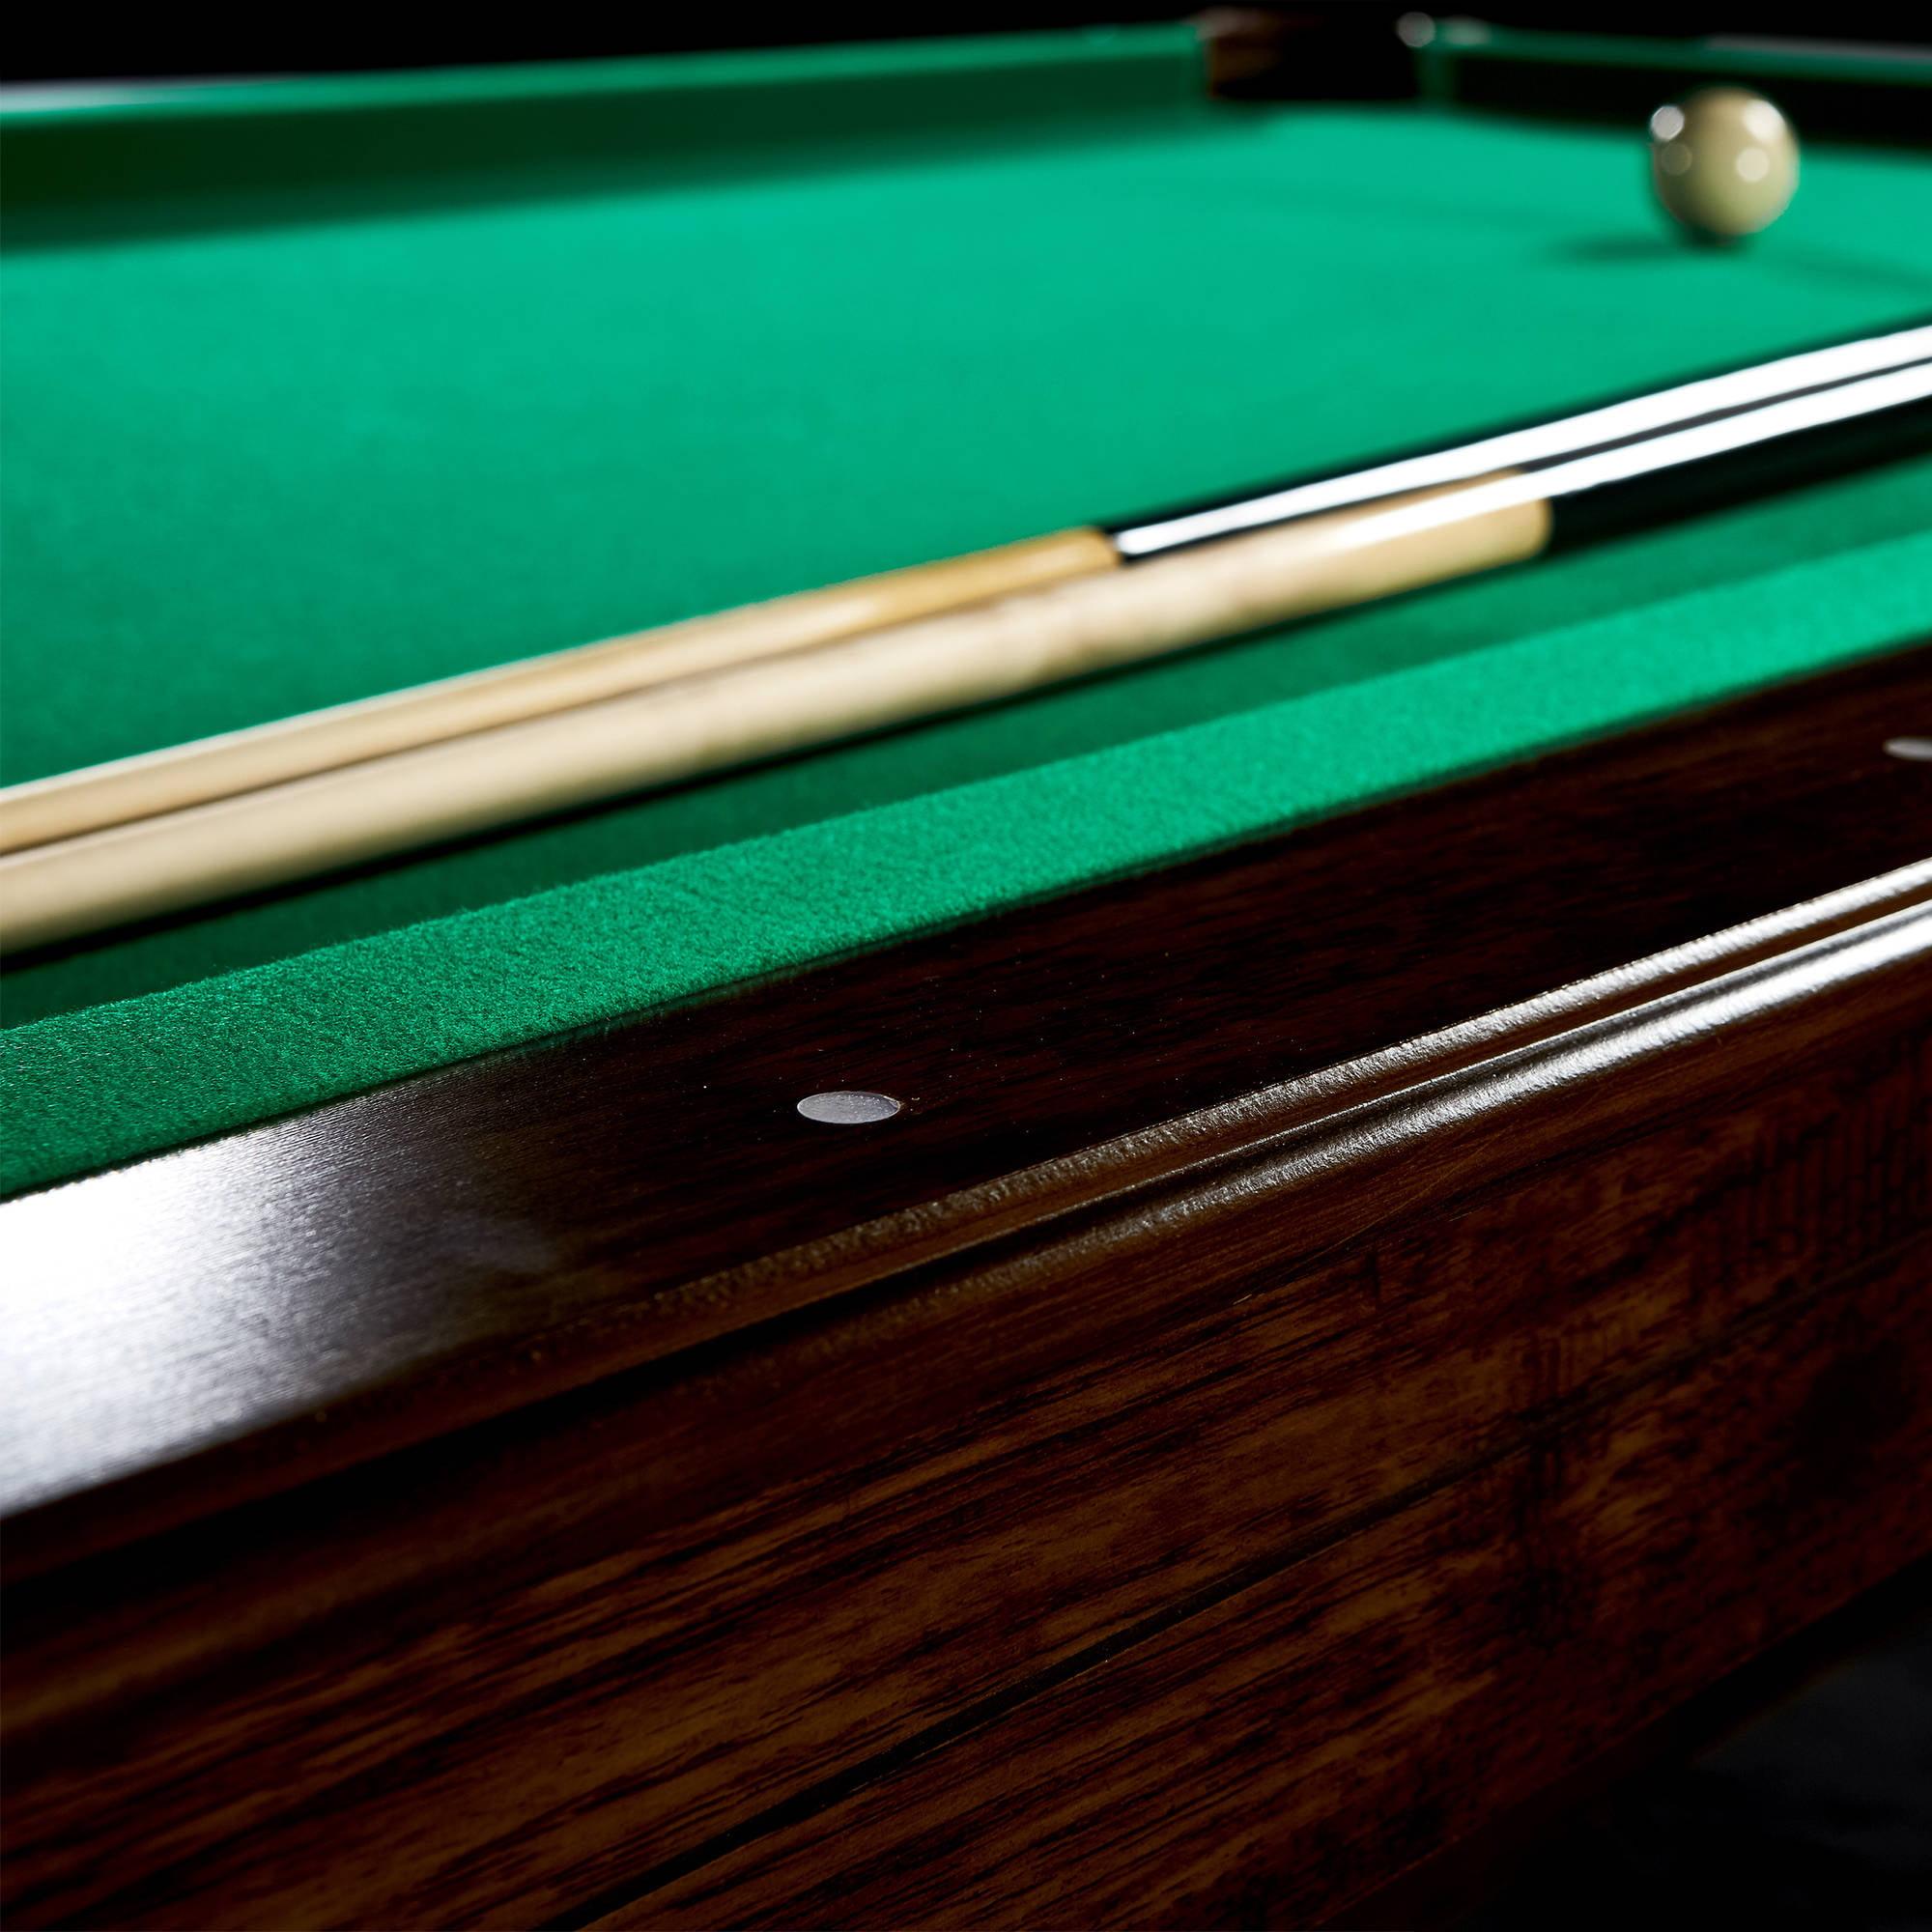 Barrington glenview 90 pool table walmart keyboard keysfo Image collections